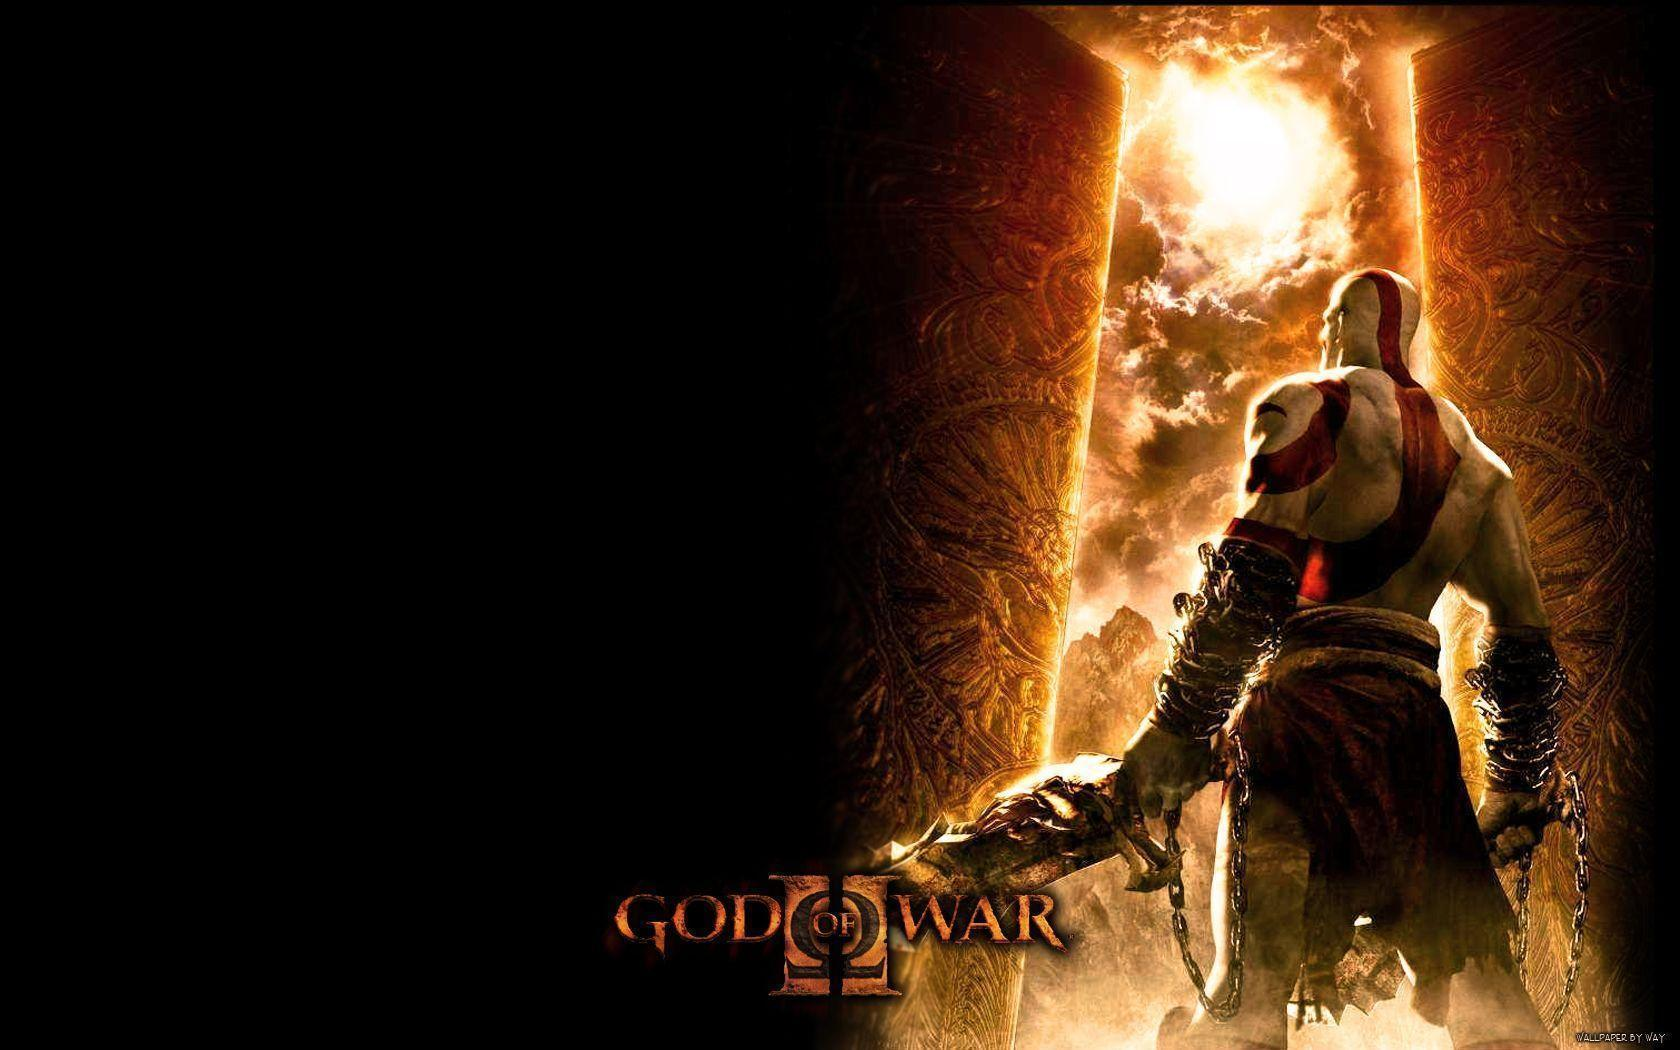 God Of War Wallpaper For Psp 42591 HD Pictures | Top Wallpaper Desktop